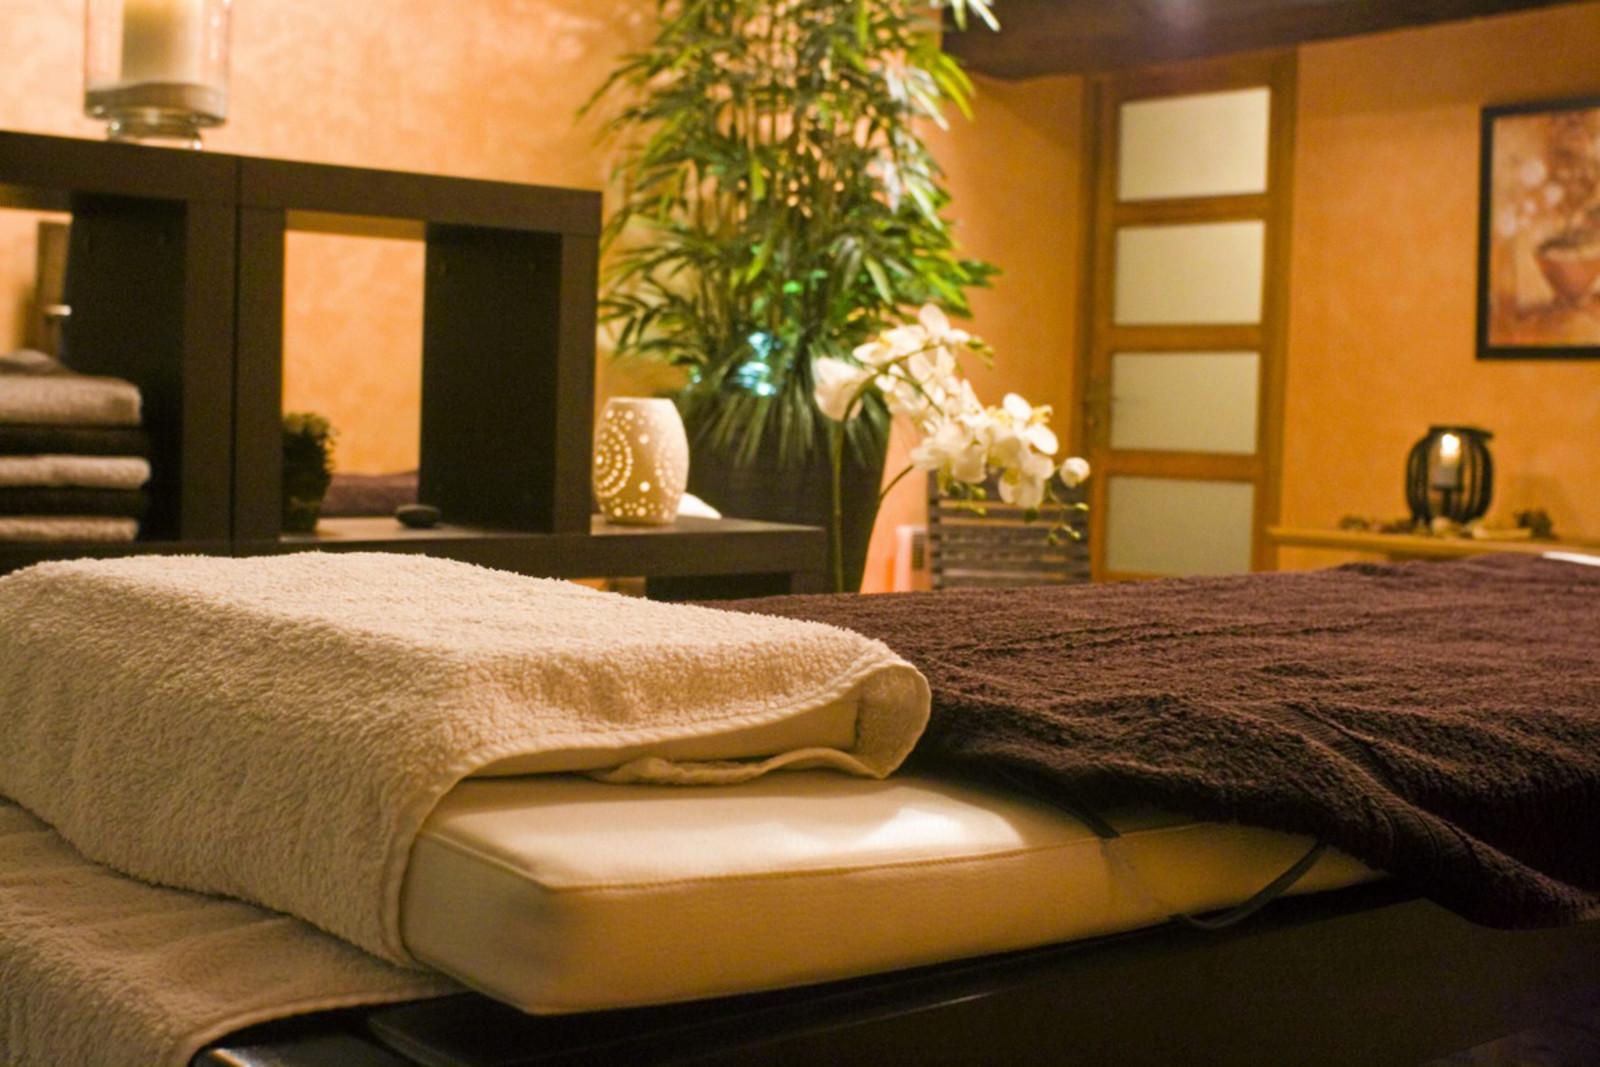 modelage relaxant pour 2 au spa cnaturel villefranche 69 wonderbox. Black Bedroom Furniture Sets. Home Design Ideas